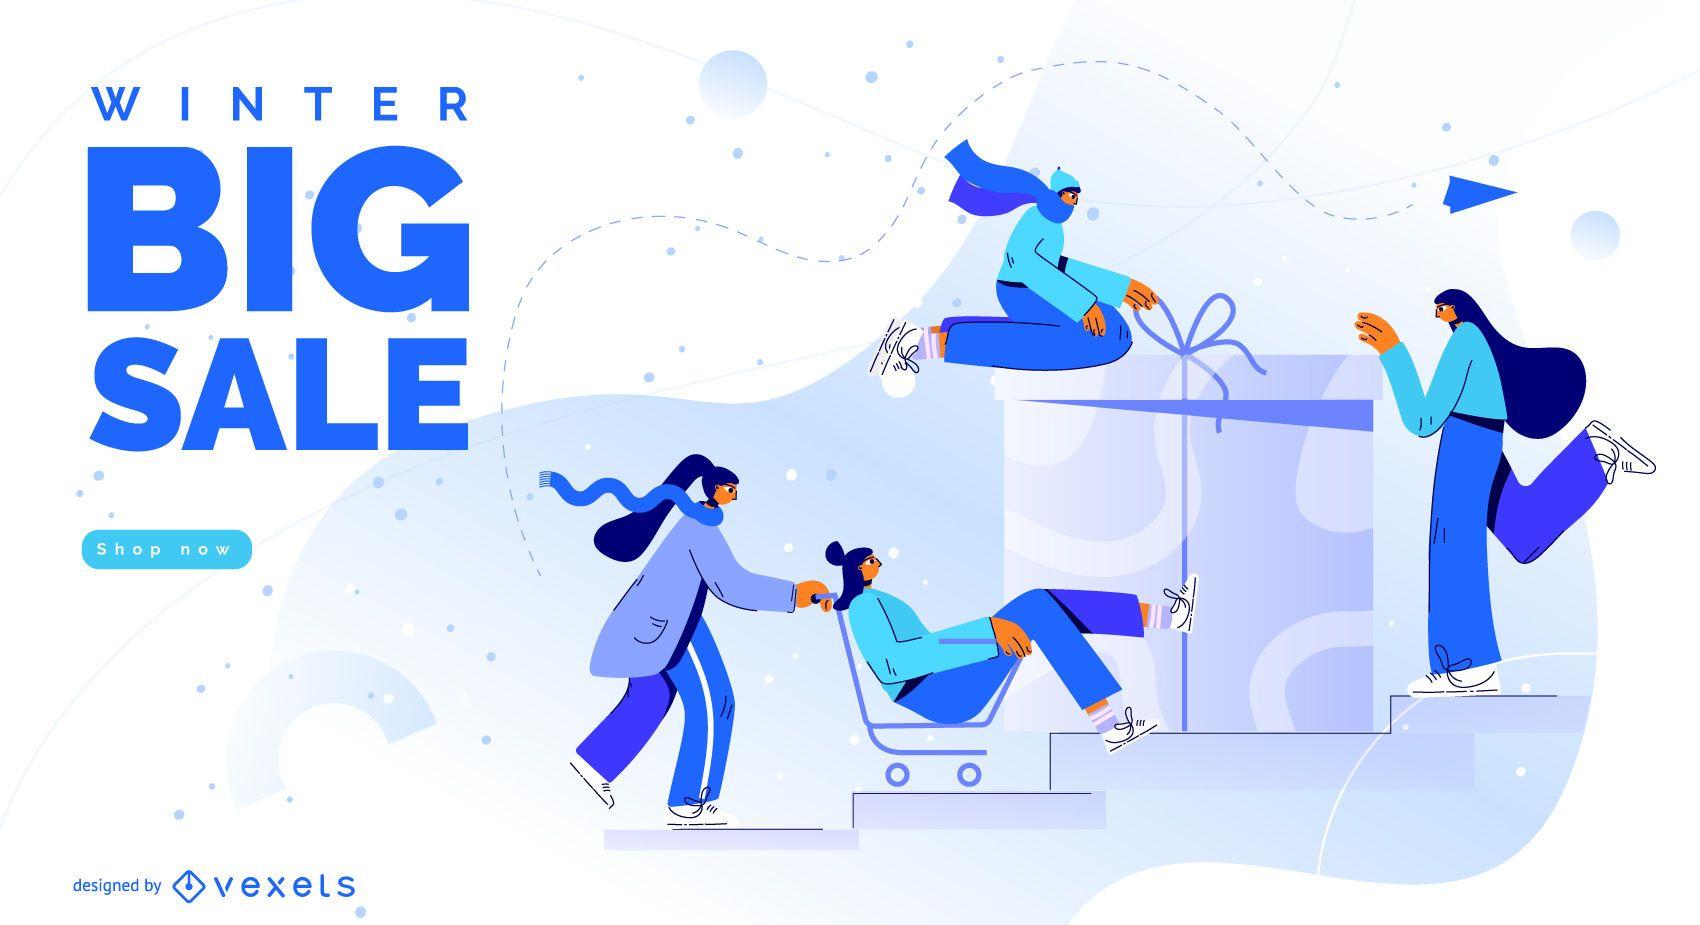 Winter big sale design